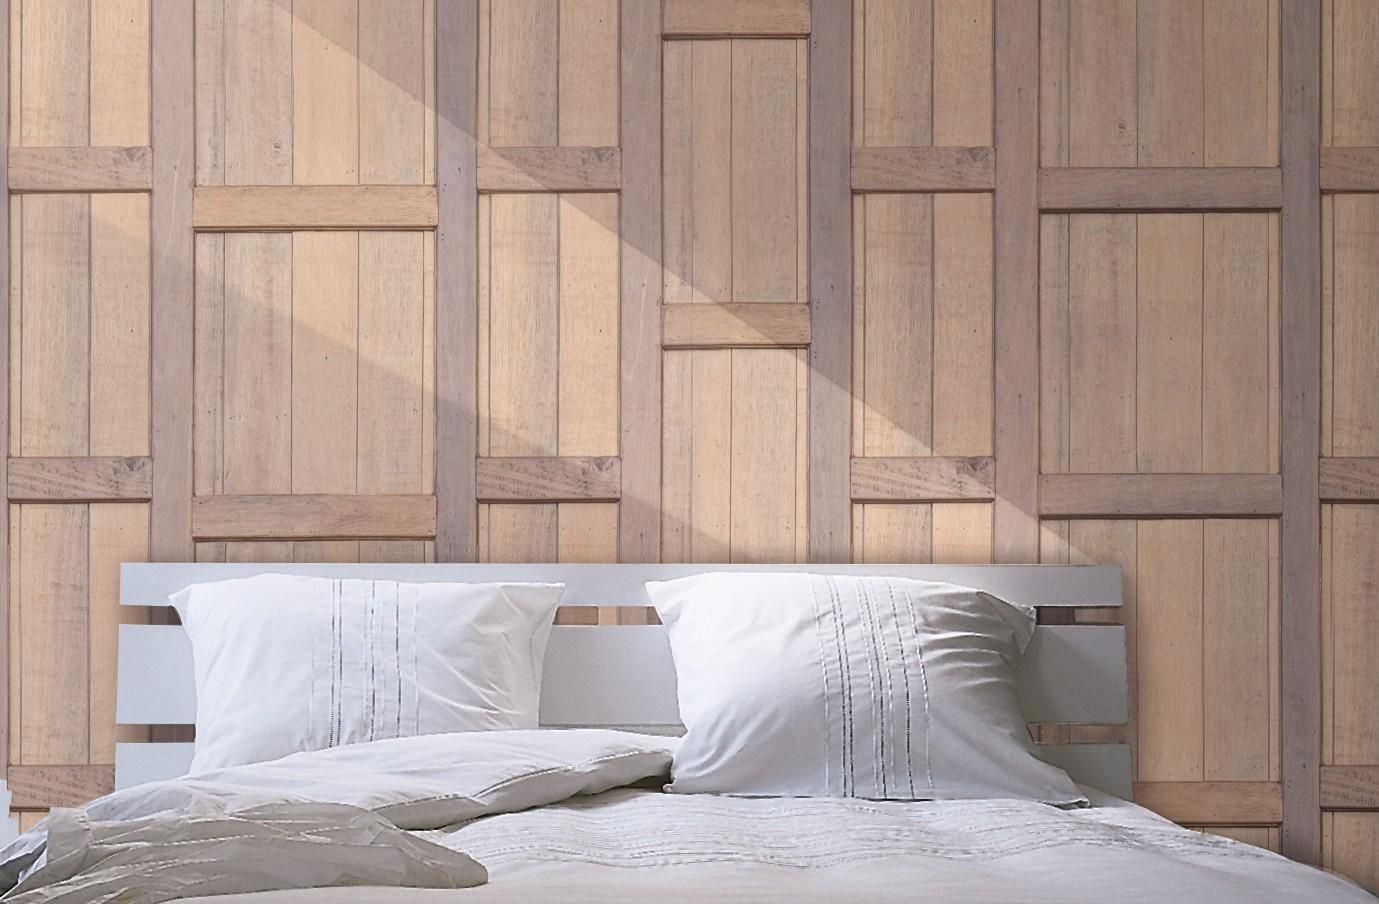 Tête de lit en bois acajou